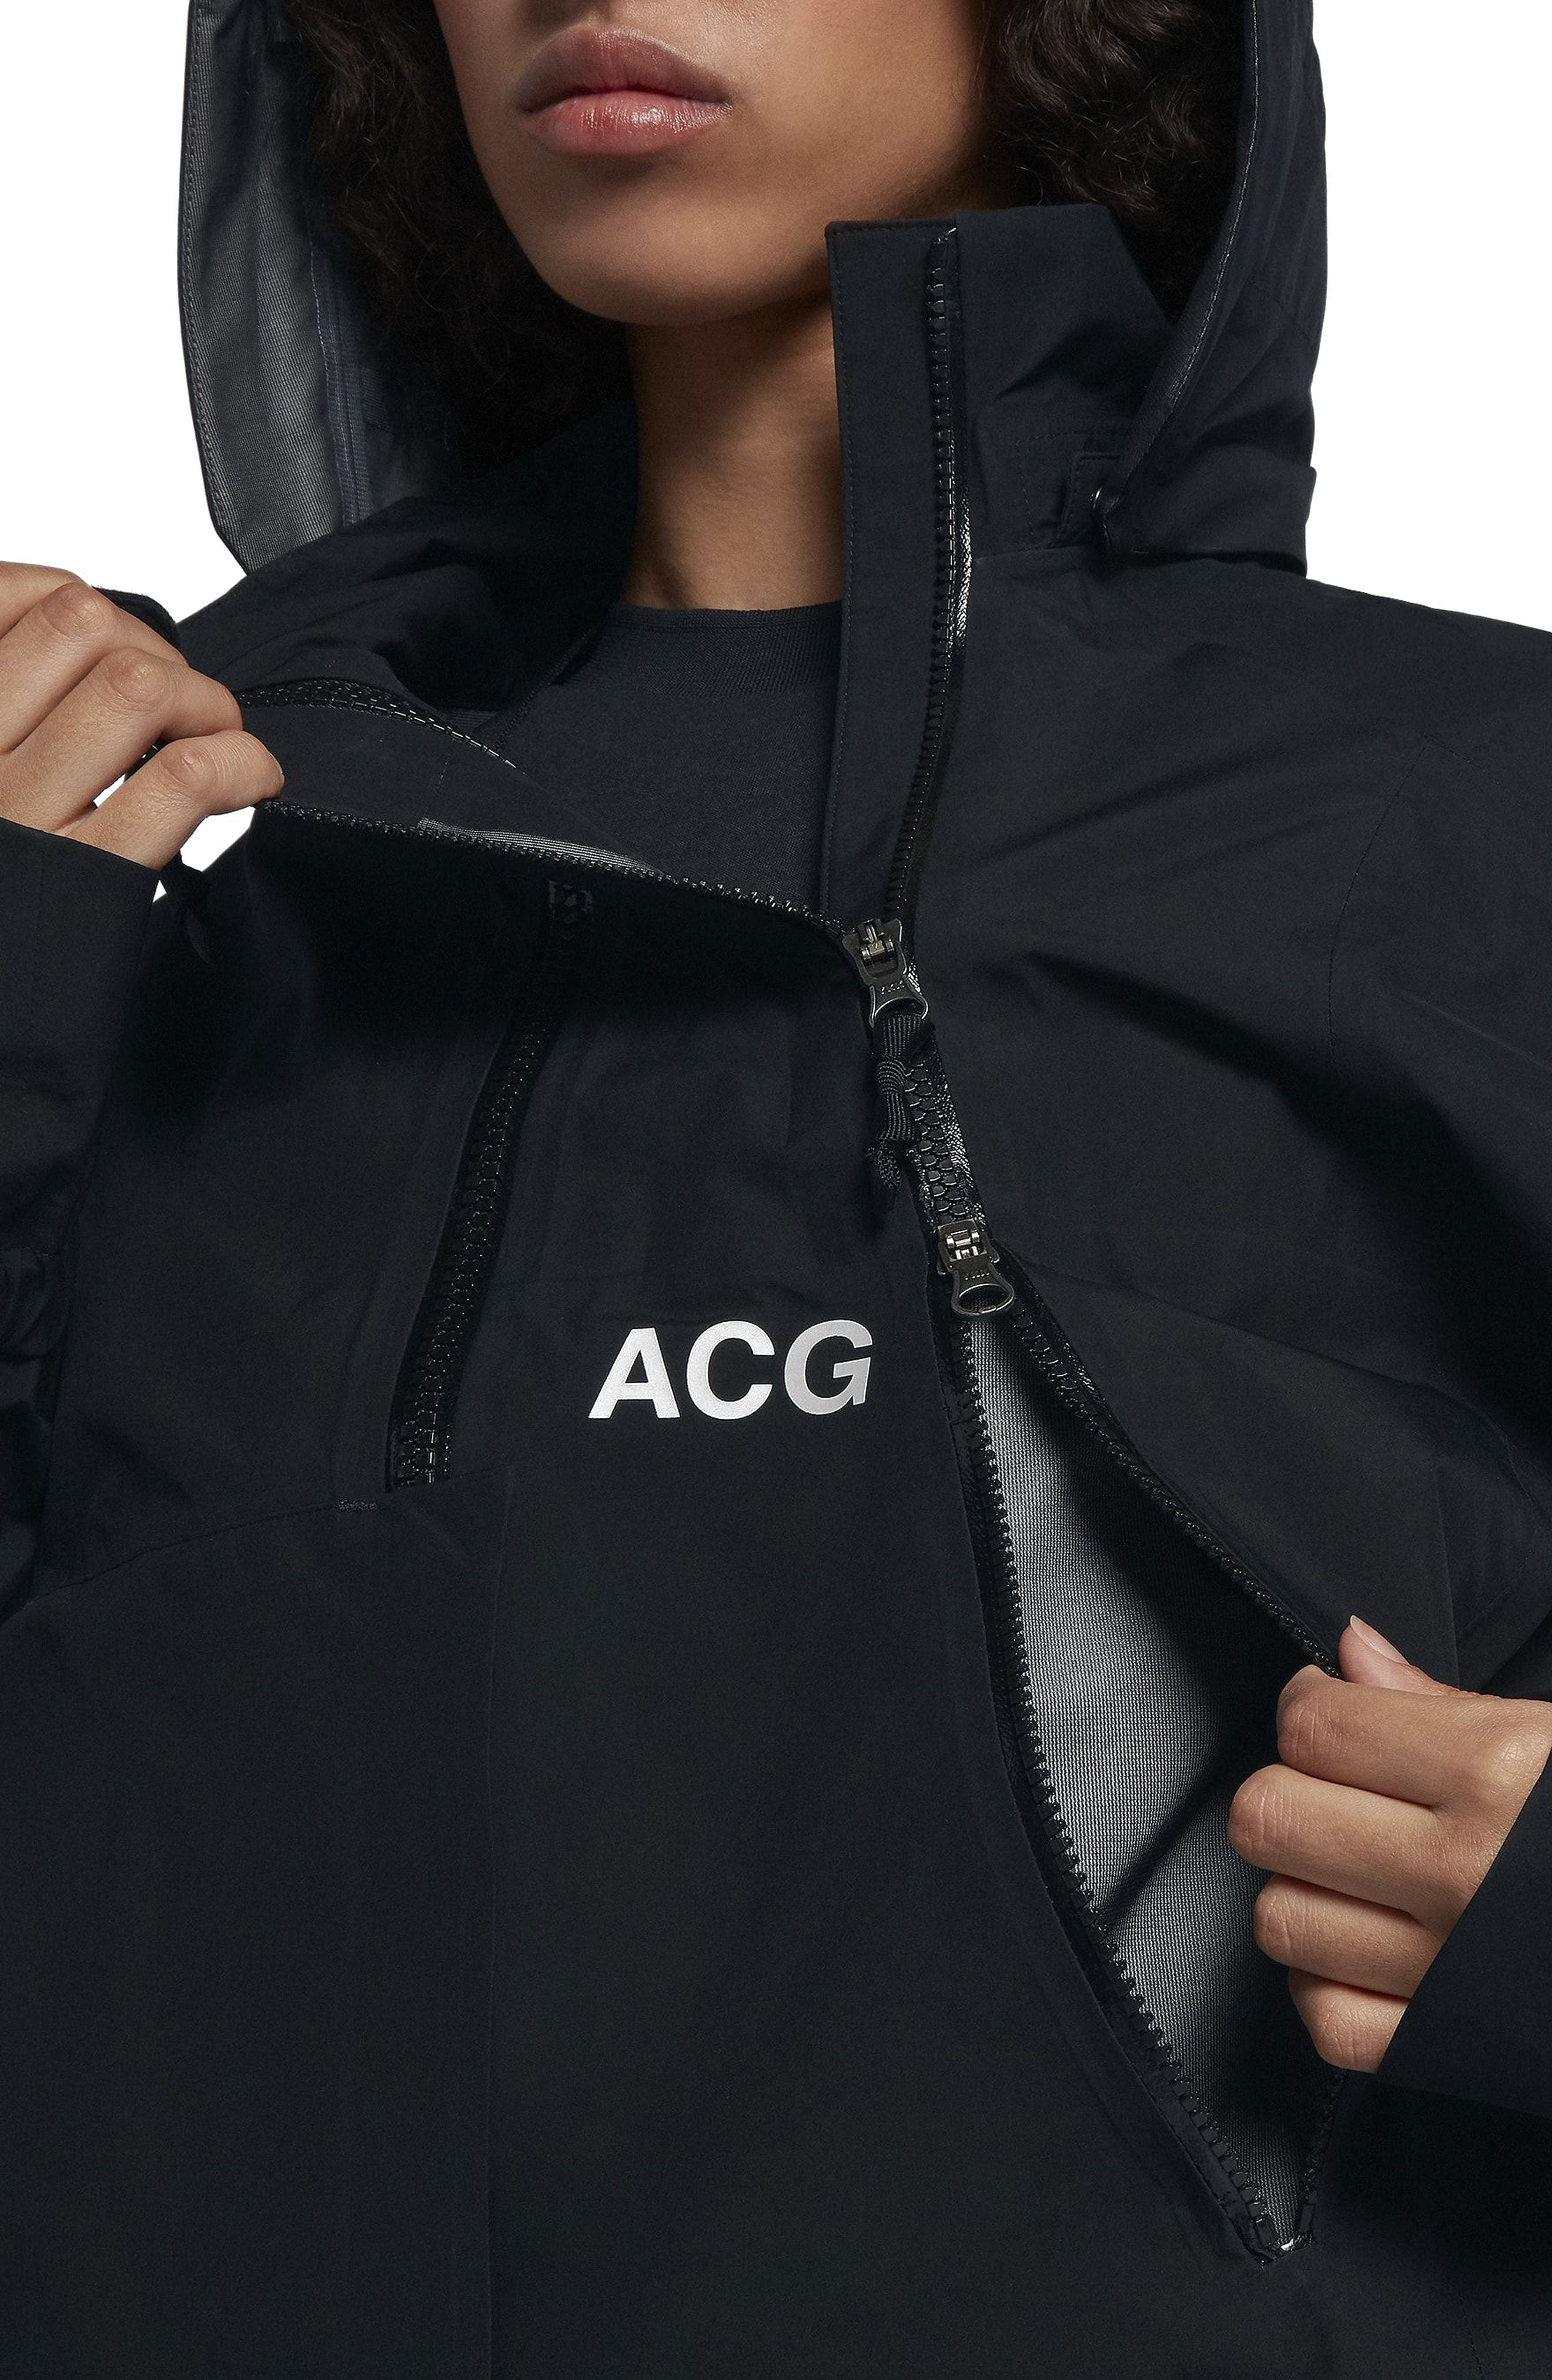 NikeLab ACG Gore-Tex<sup>®</sup> Women's Jacket,                             Alternate thumbnail 5, color,                             010